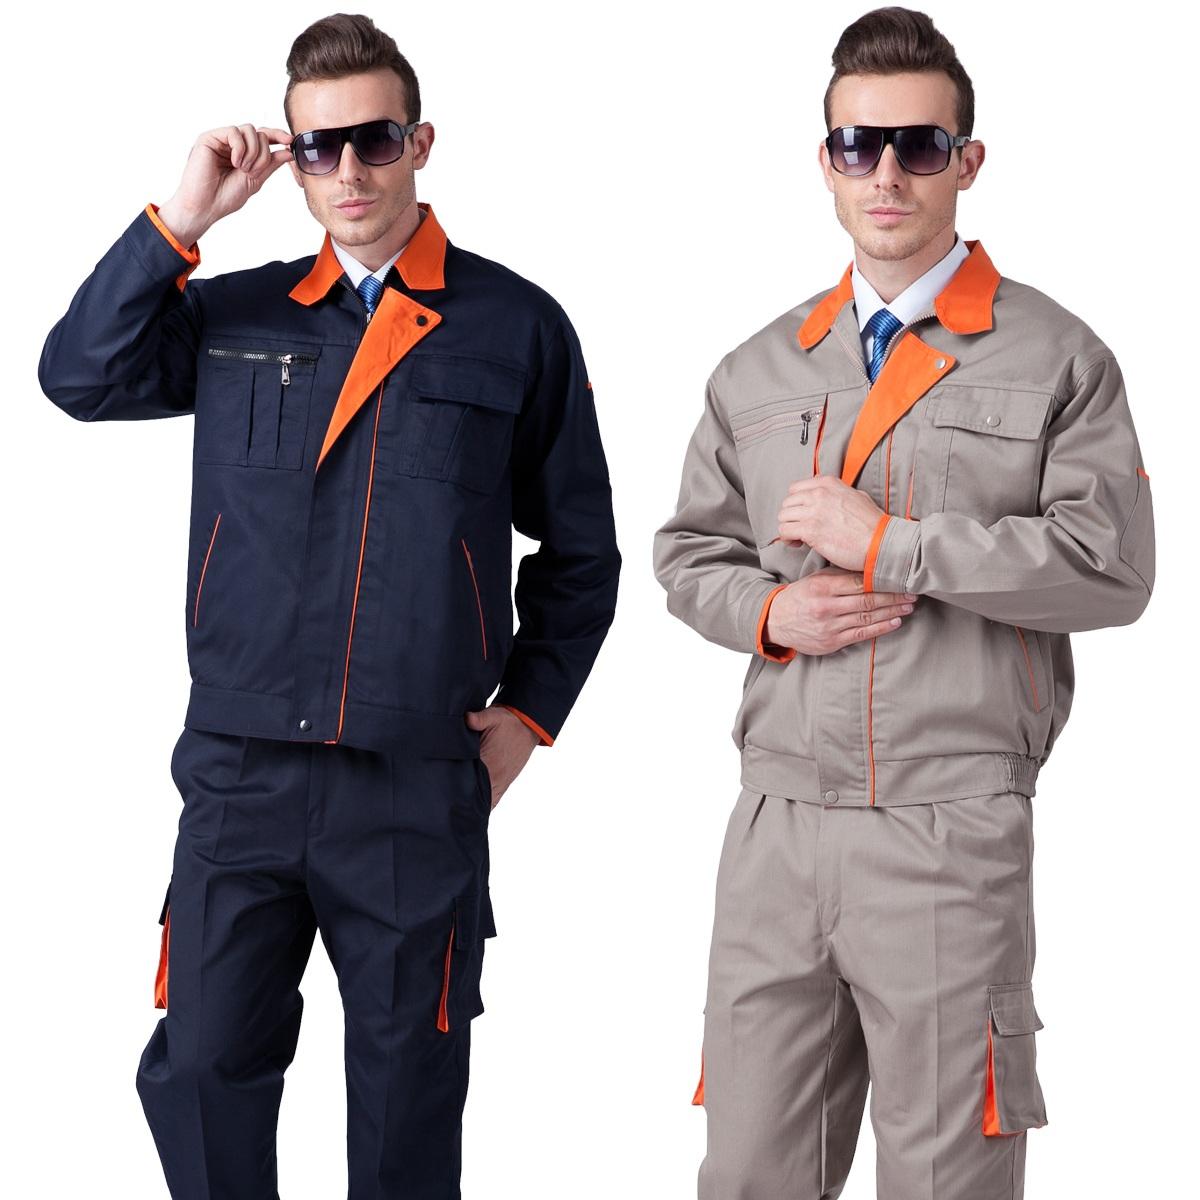 Quần áo bhld A022